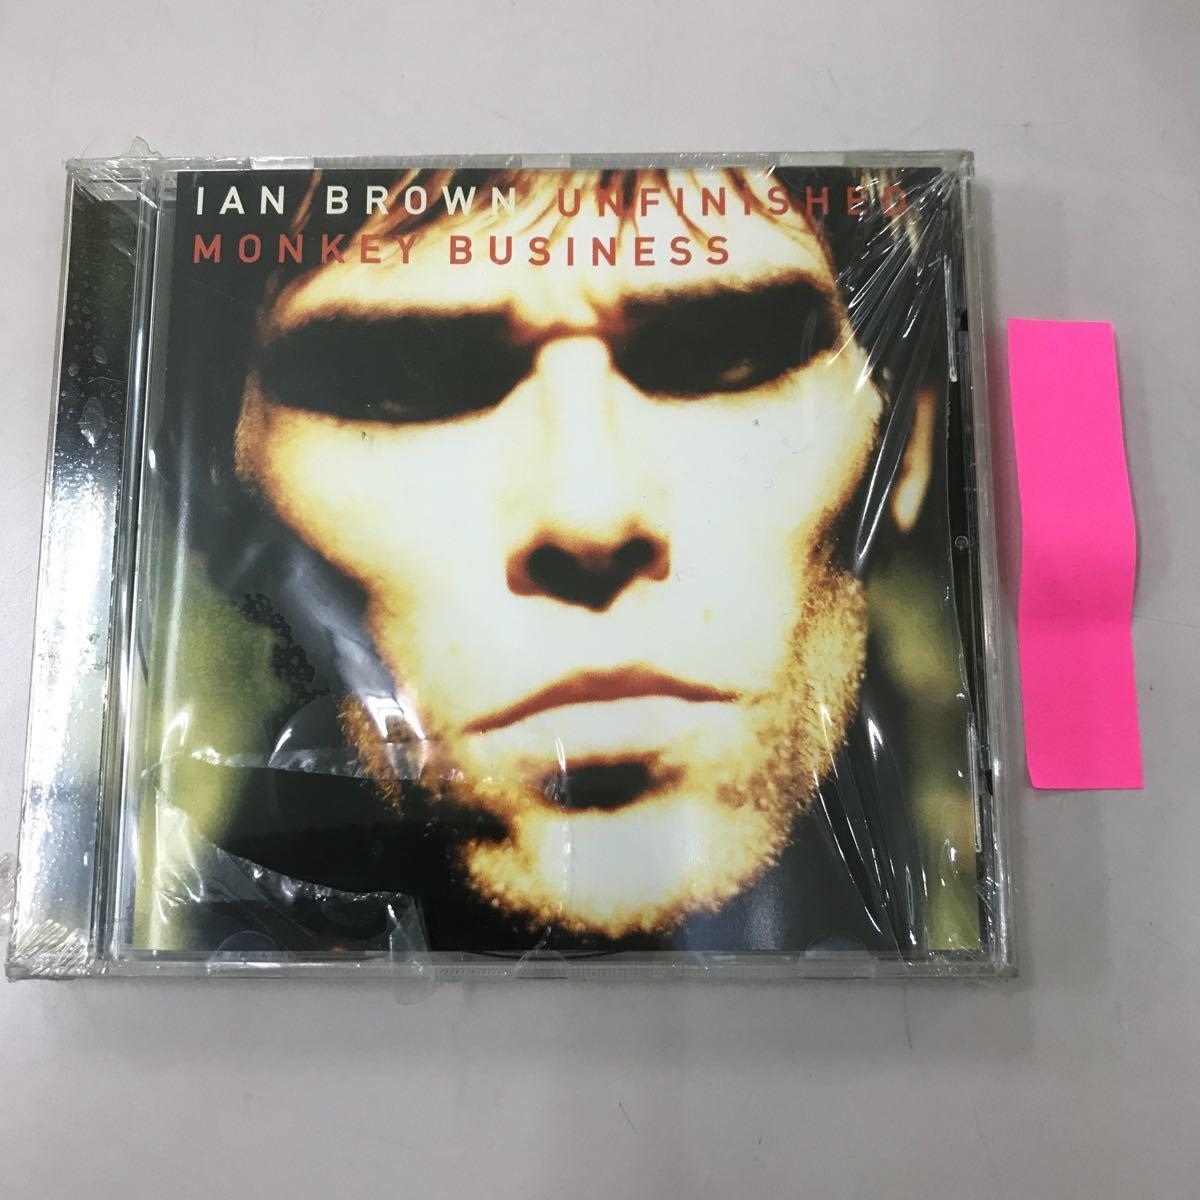 CD 輸入盤未開封【洋楽】長期保存品 UNFINISHED MONKEY BUSINESS